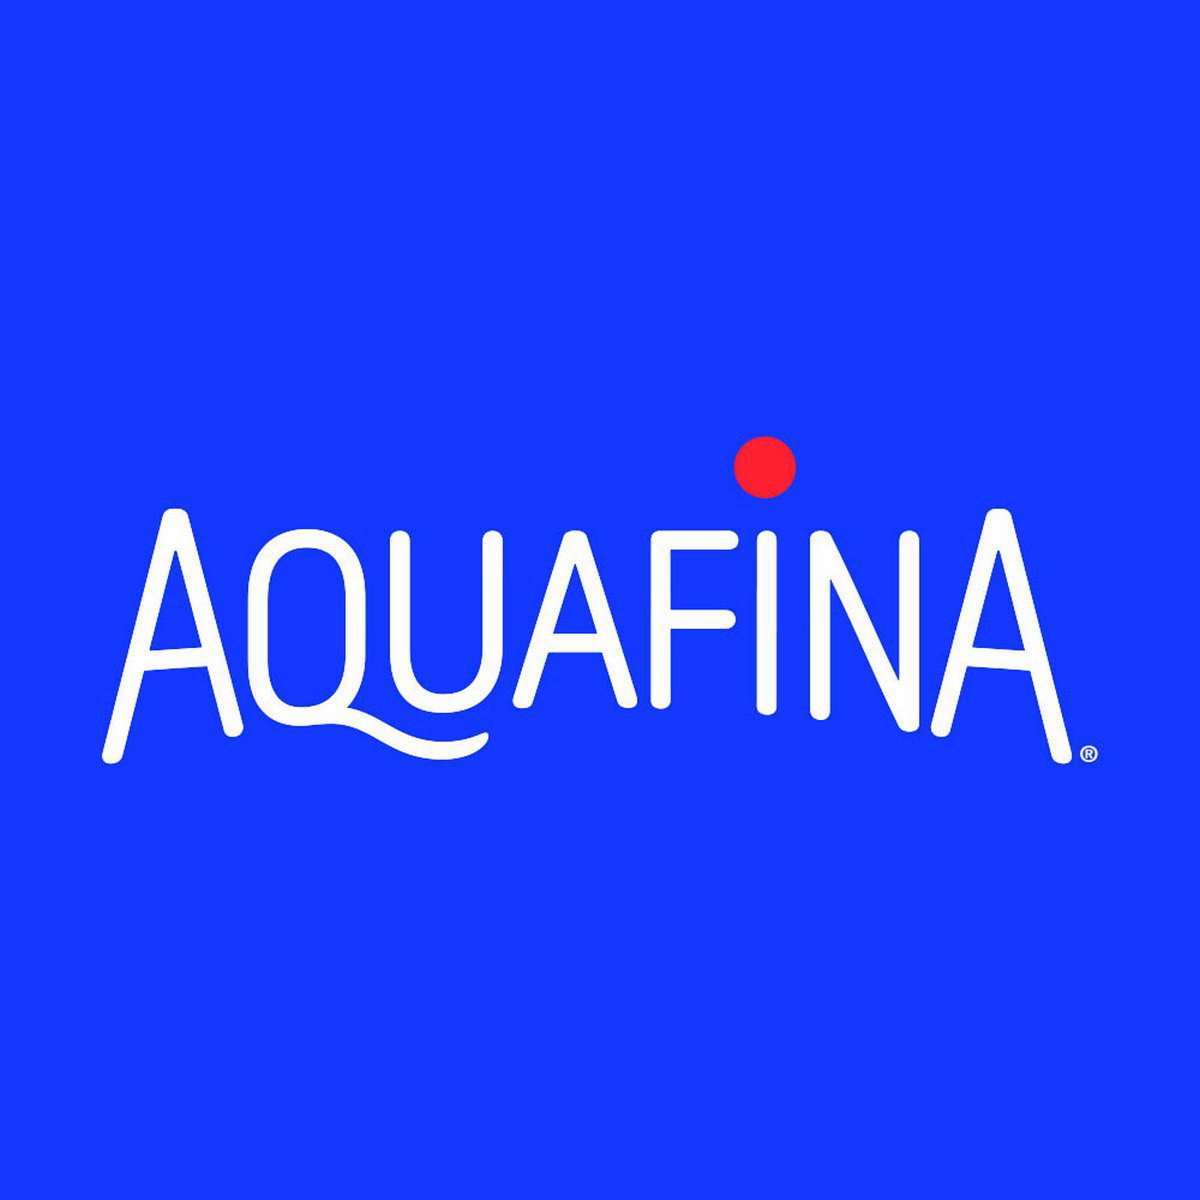 Marketing mix of Aquafina - Aquafina Marketing mix